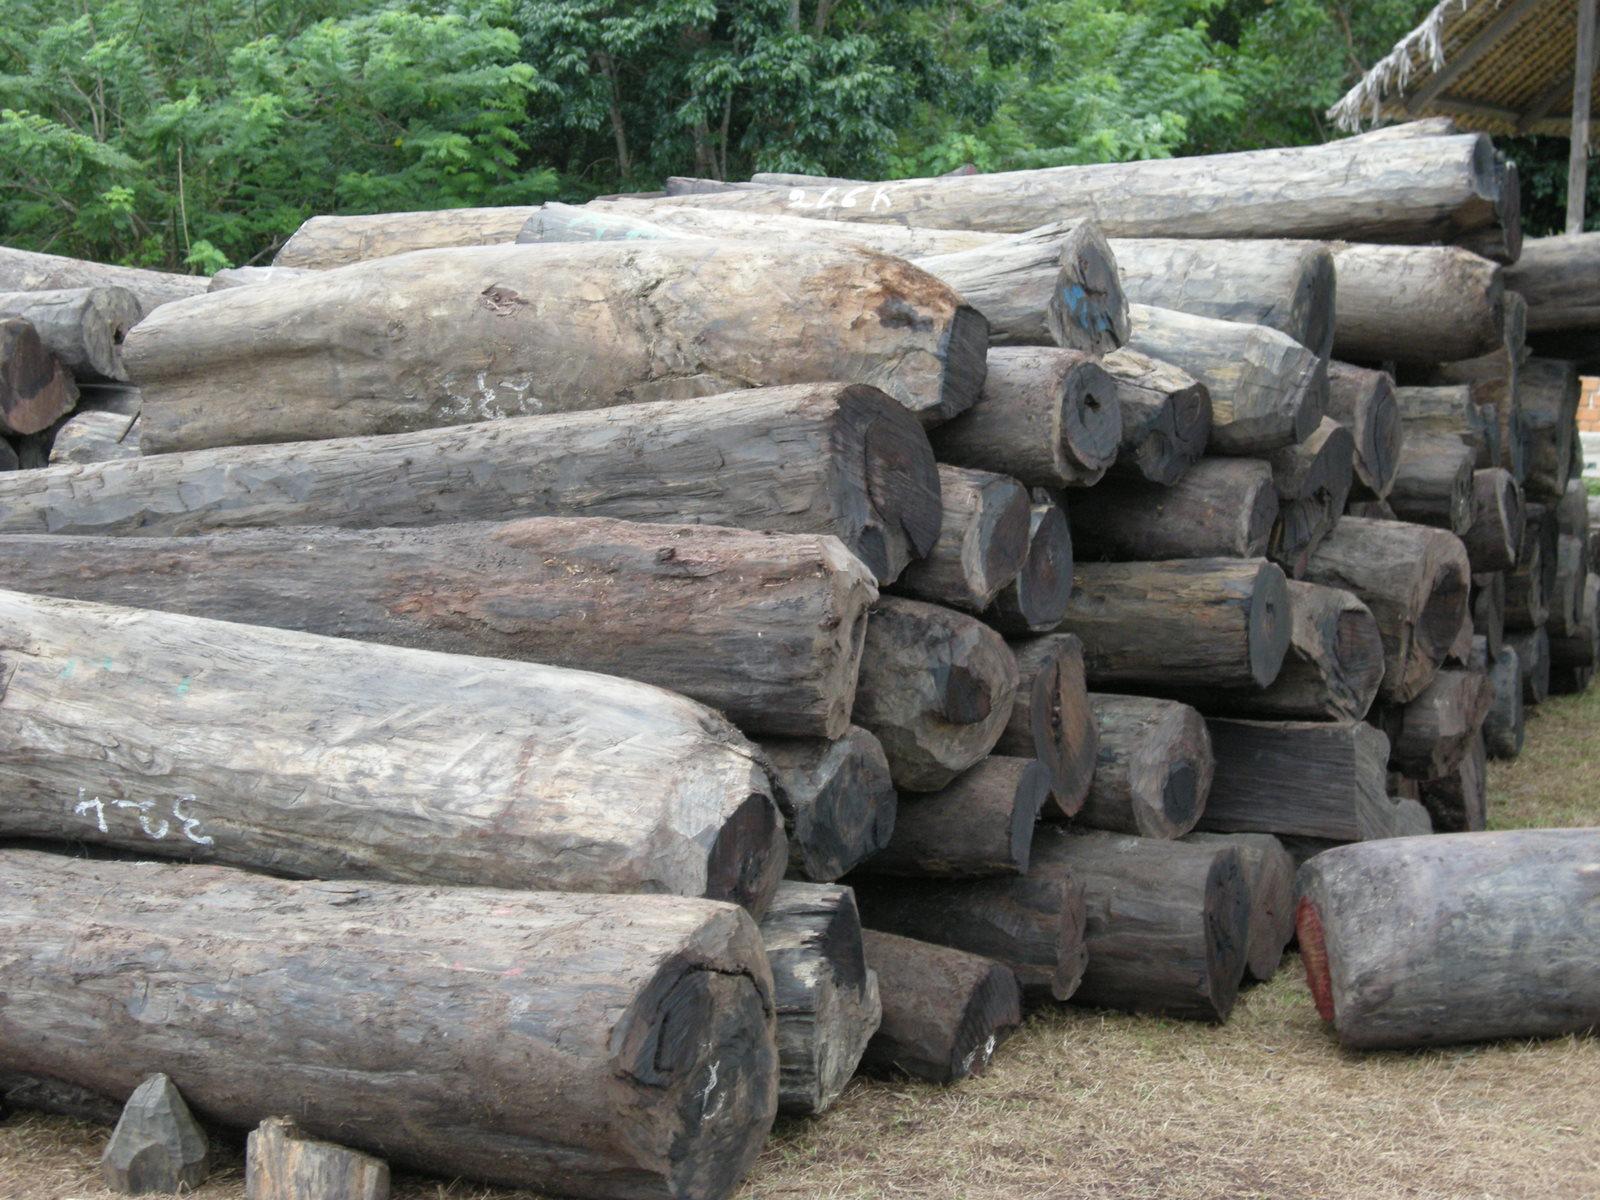 Description Illegal rosewood stockpiles 004.jpg